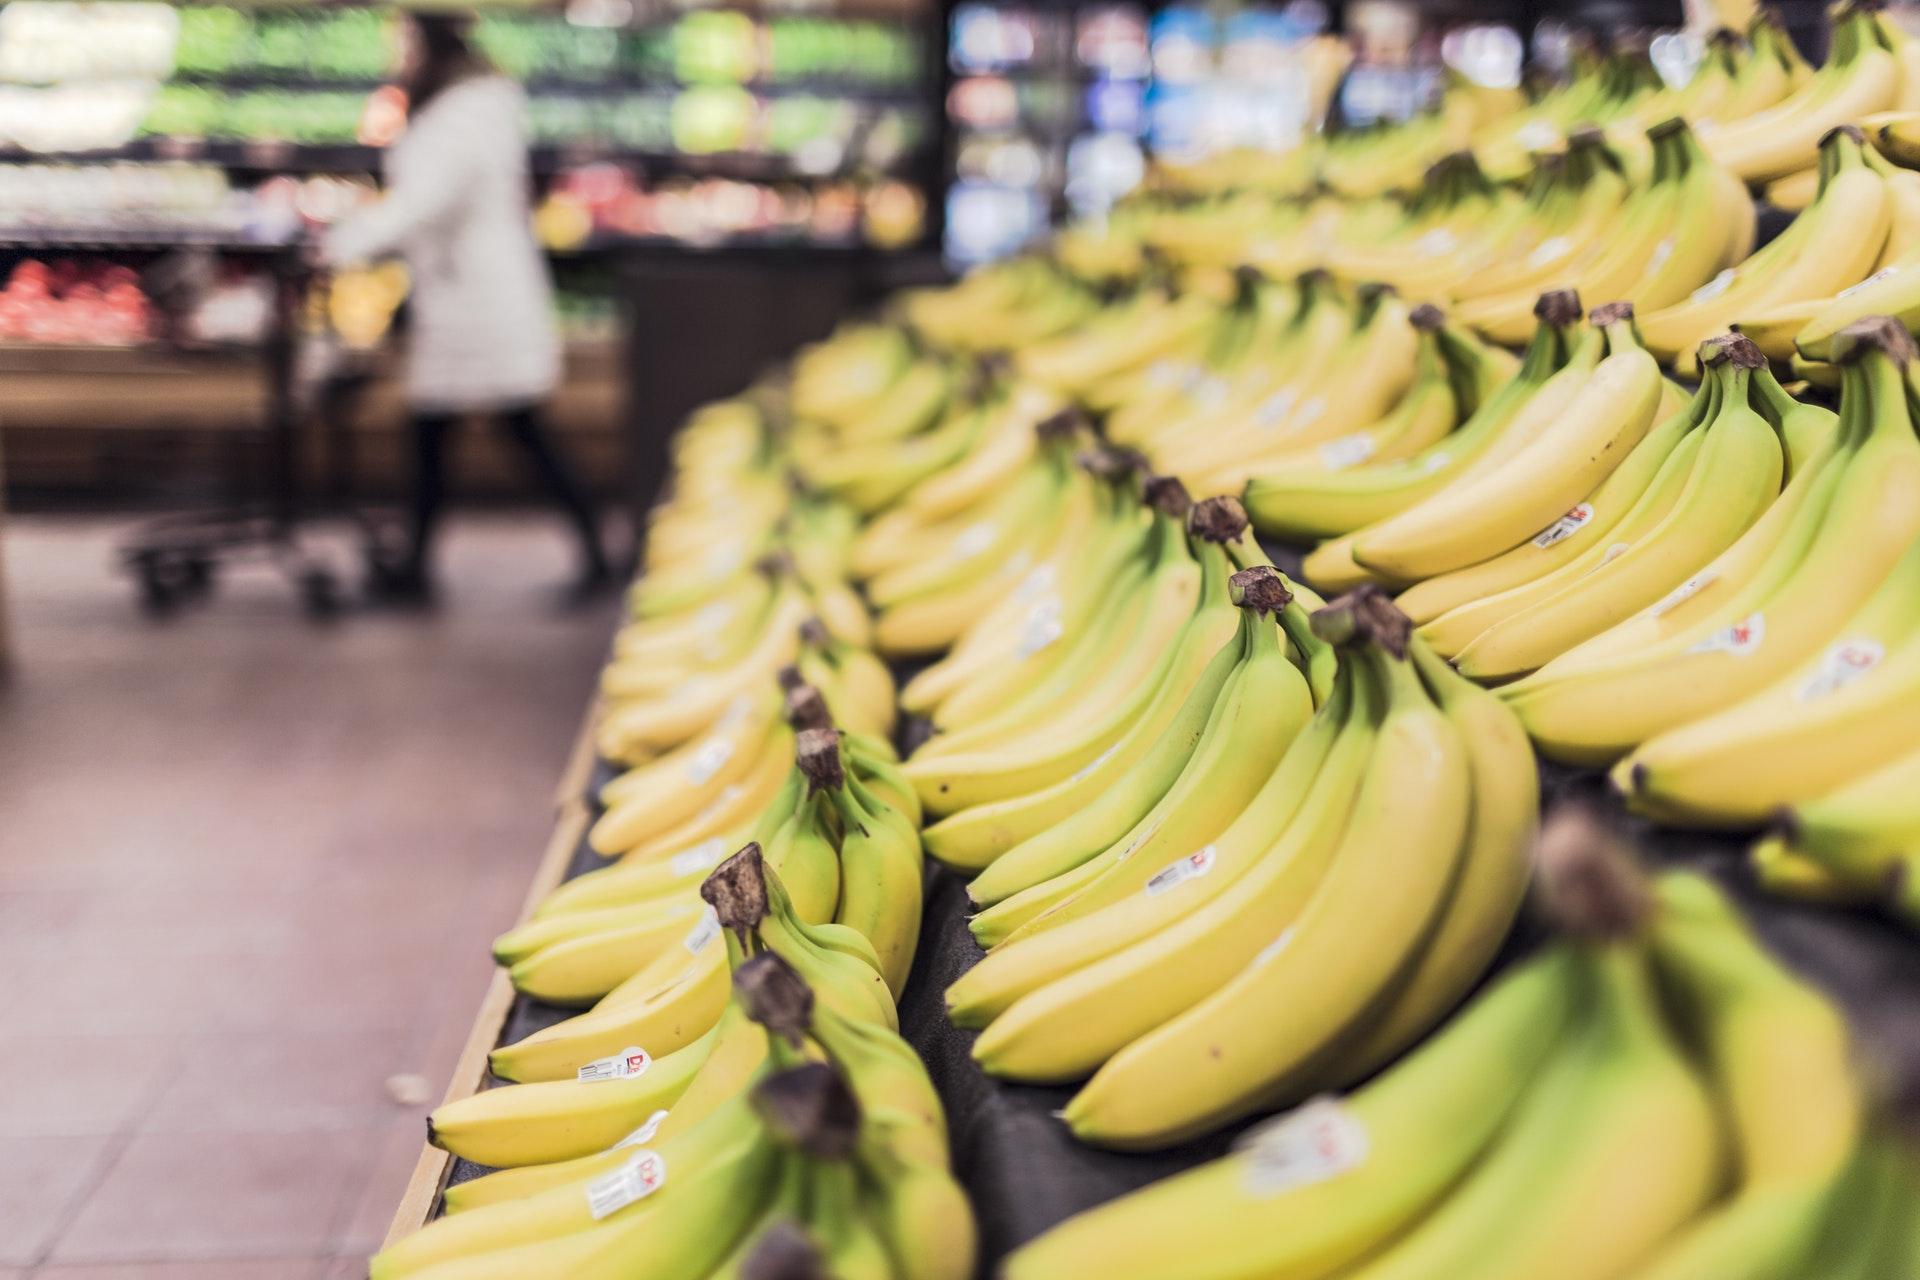 fruits-grocery-bananas-market.jpg